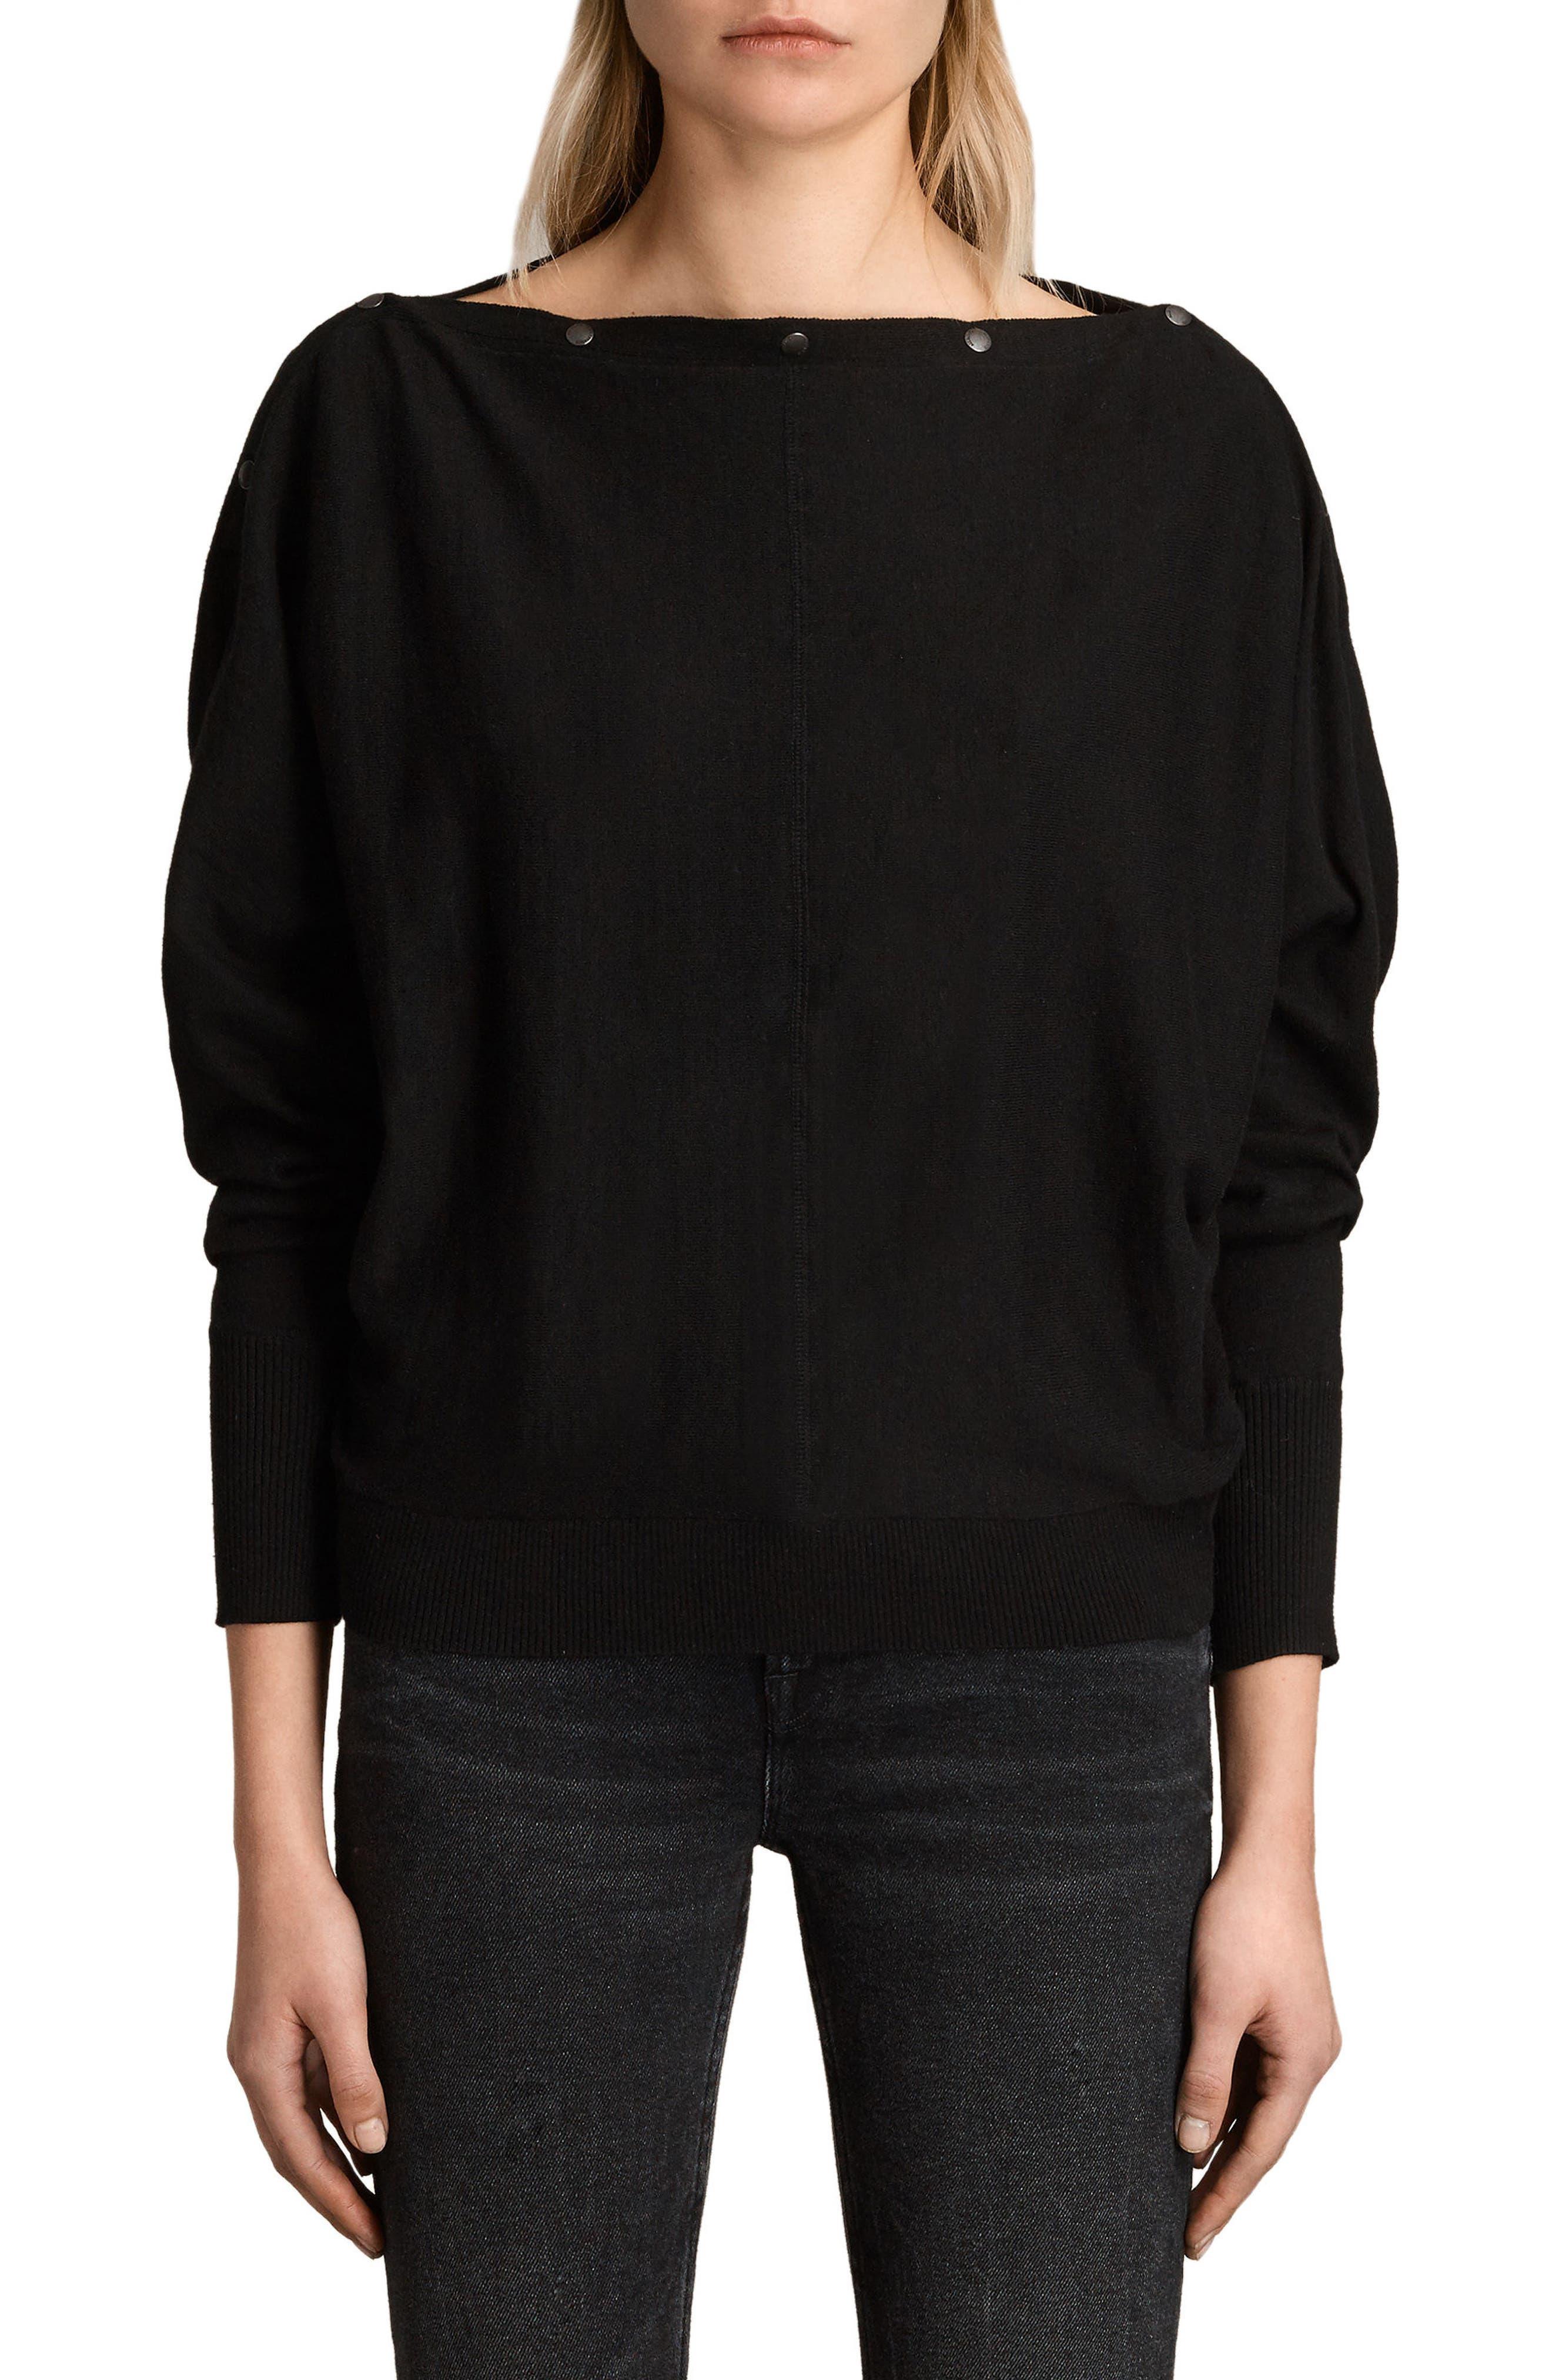 ALLSAINTS Elle Snap-Detail Sweater in Black